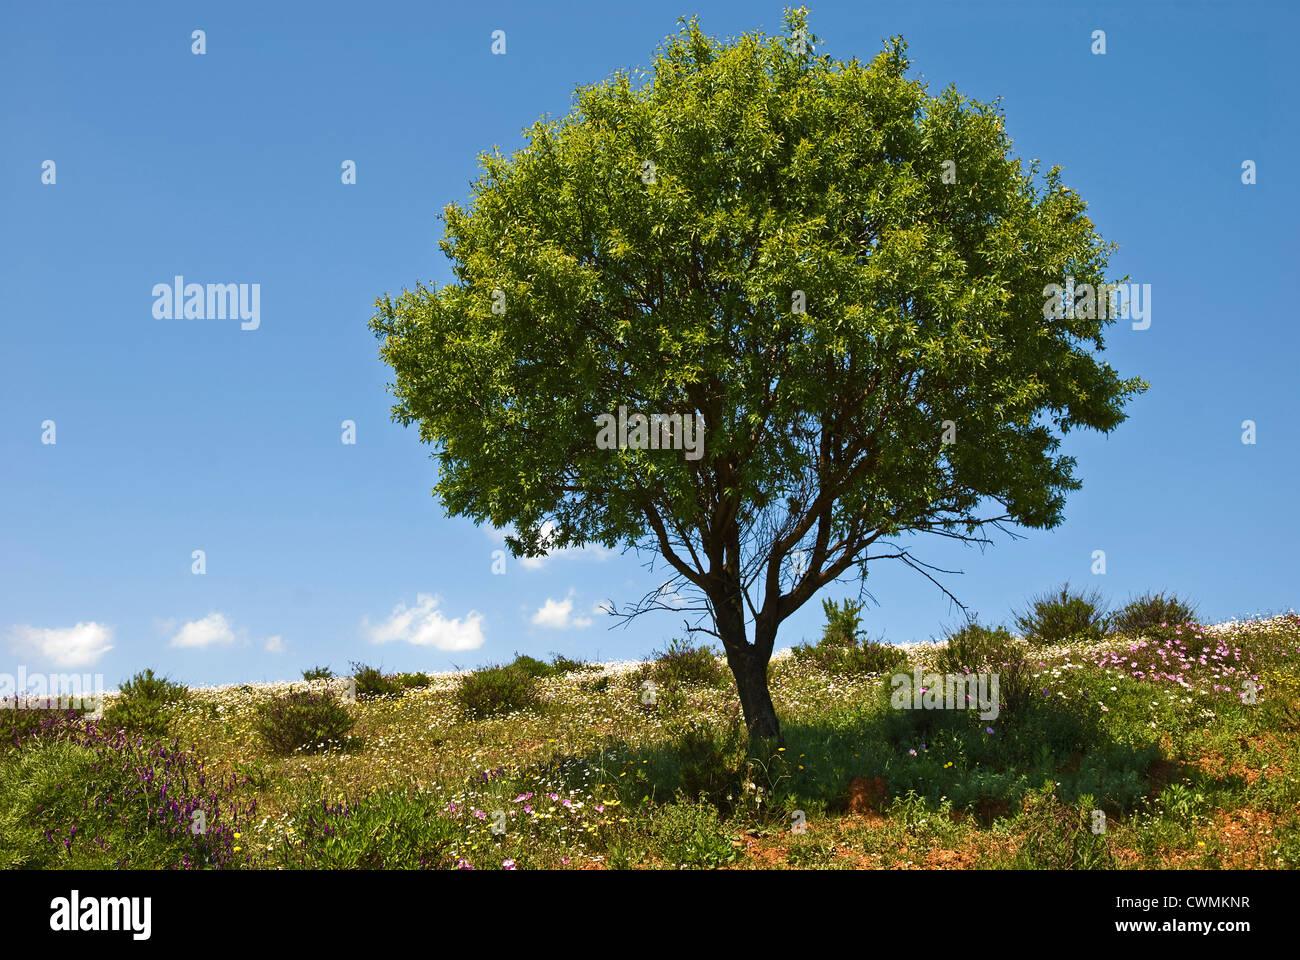 Almond tree on flowering meadow in springtime - Stock Image